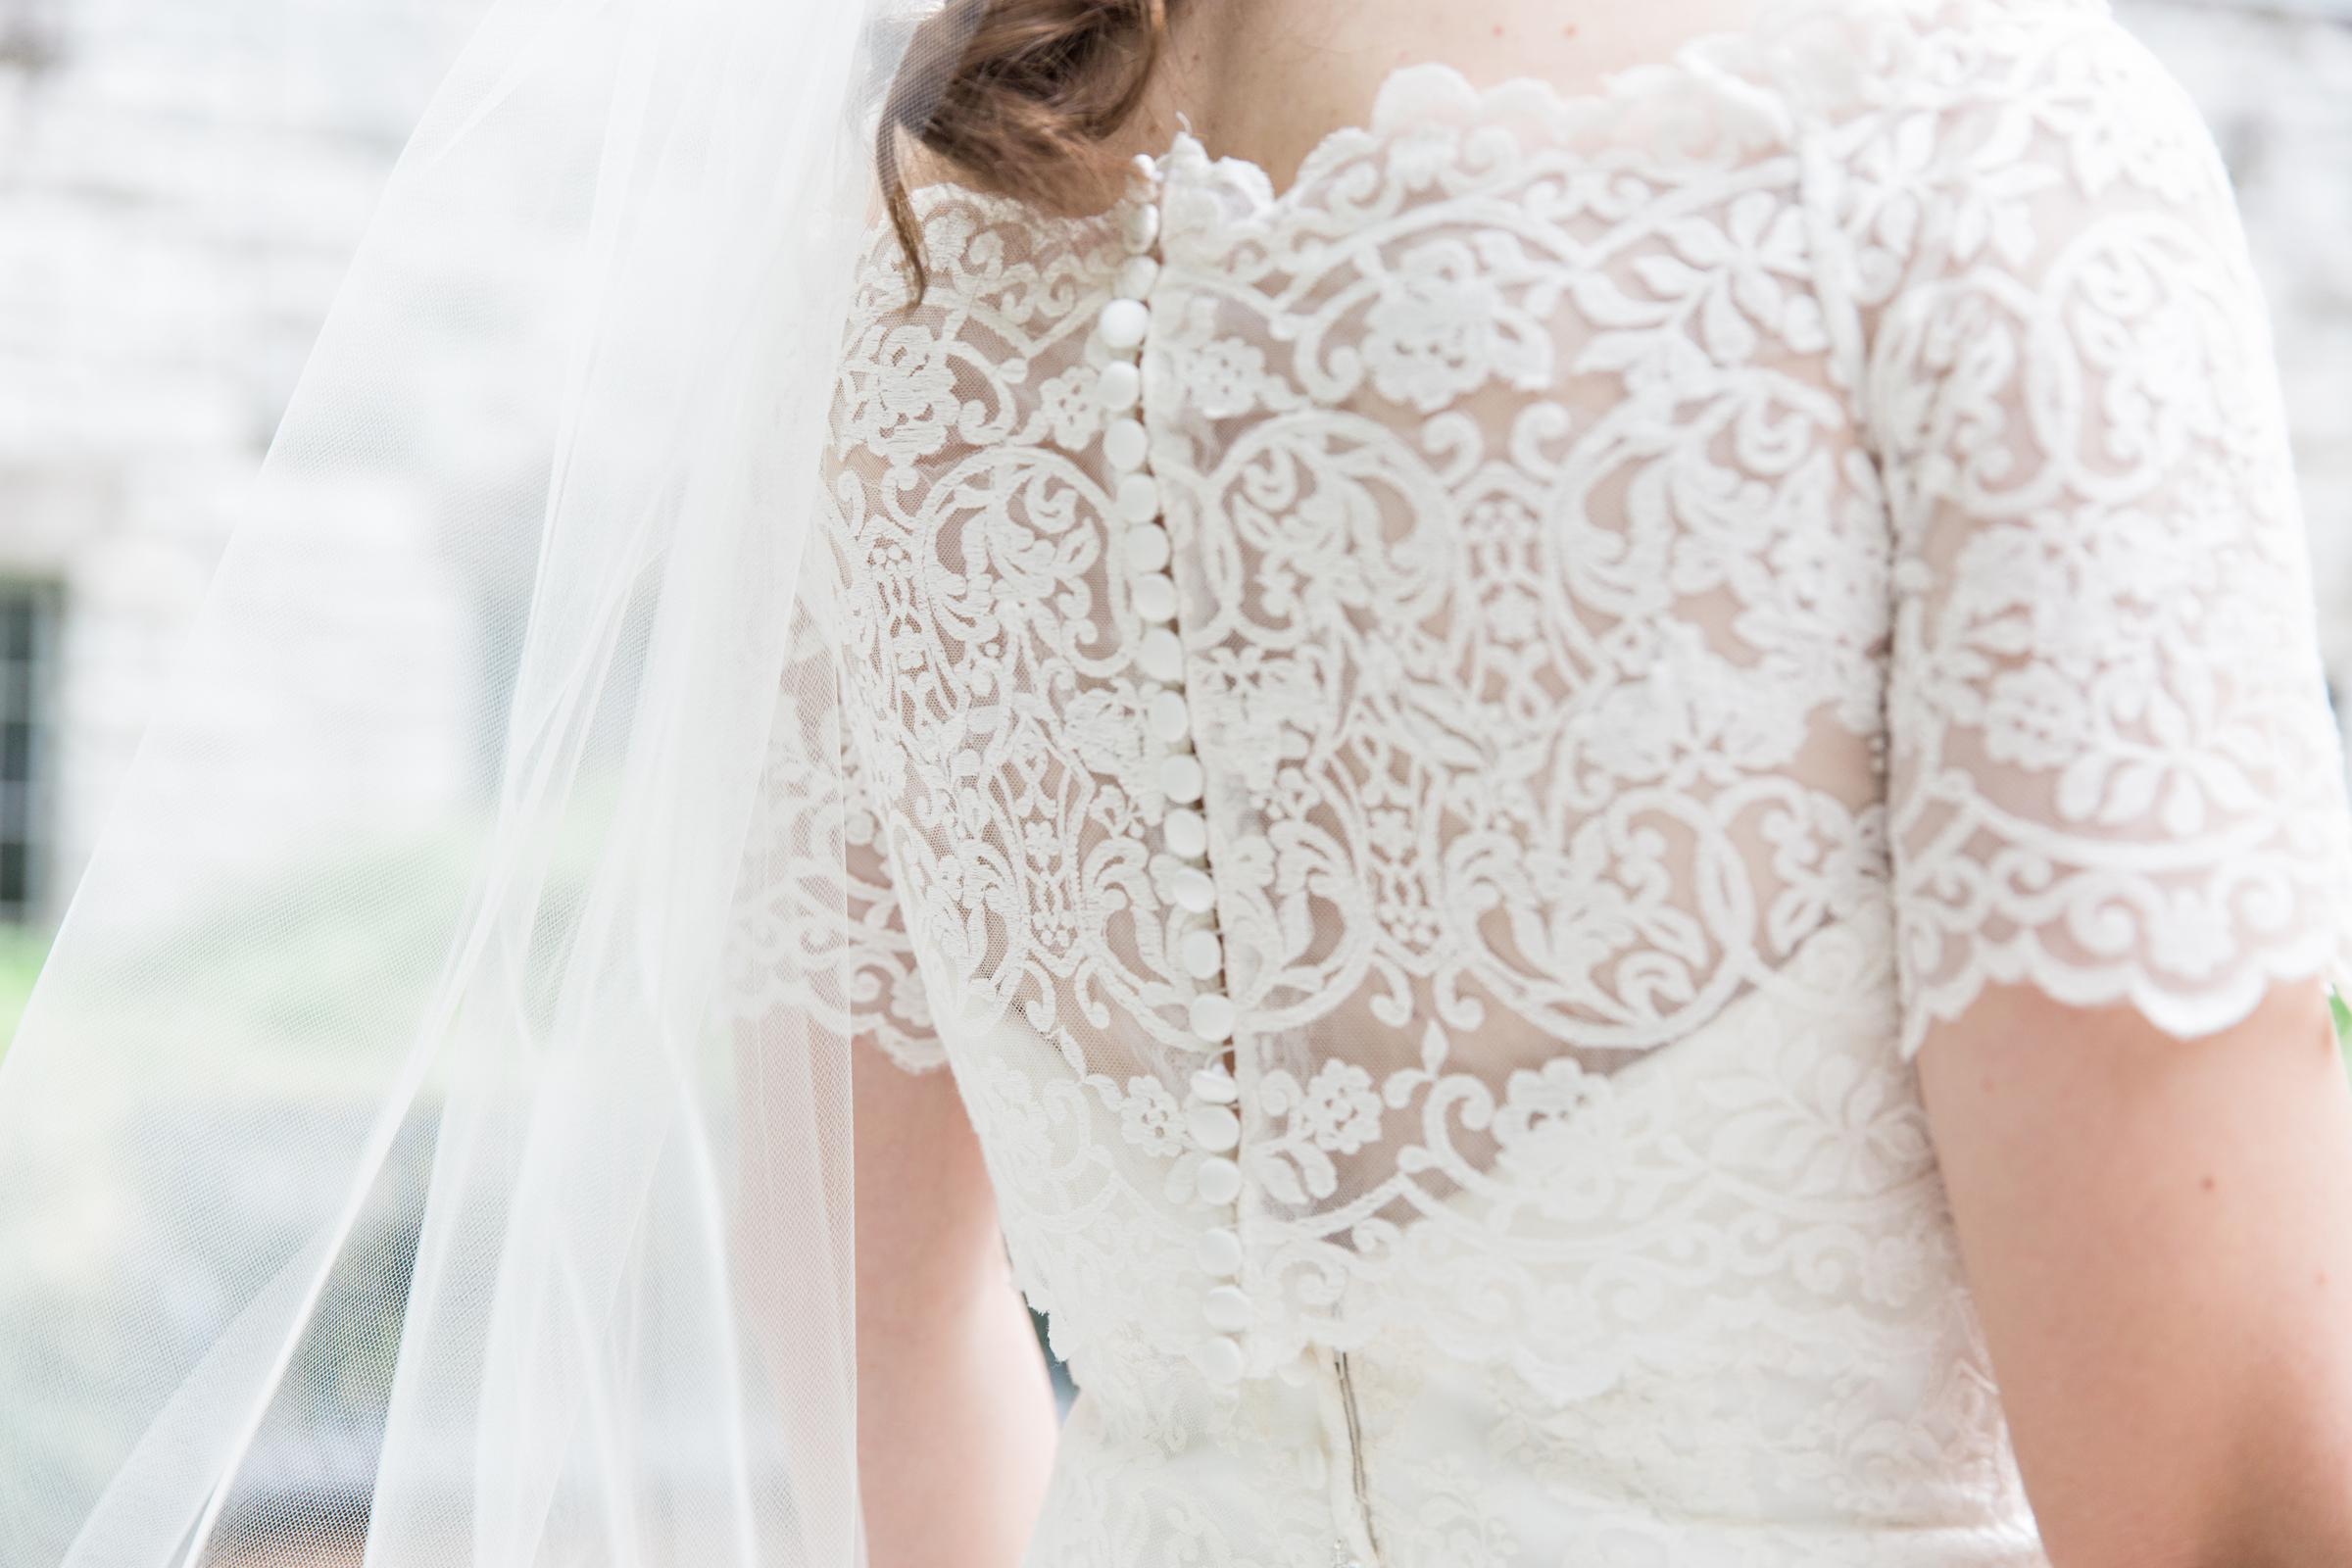 Ni ck-Drollette-Photography-Montgomery-Alabama-Weddings-133.jpg